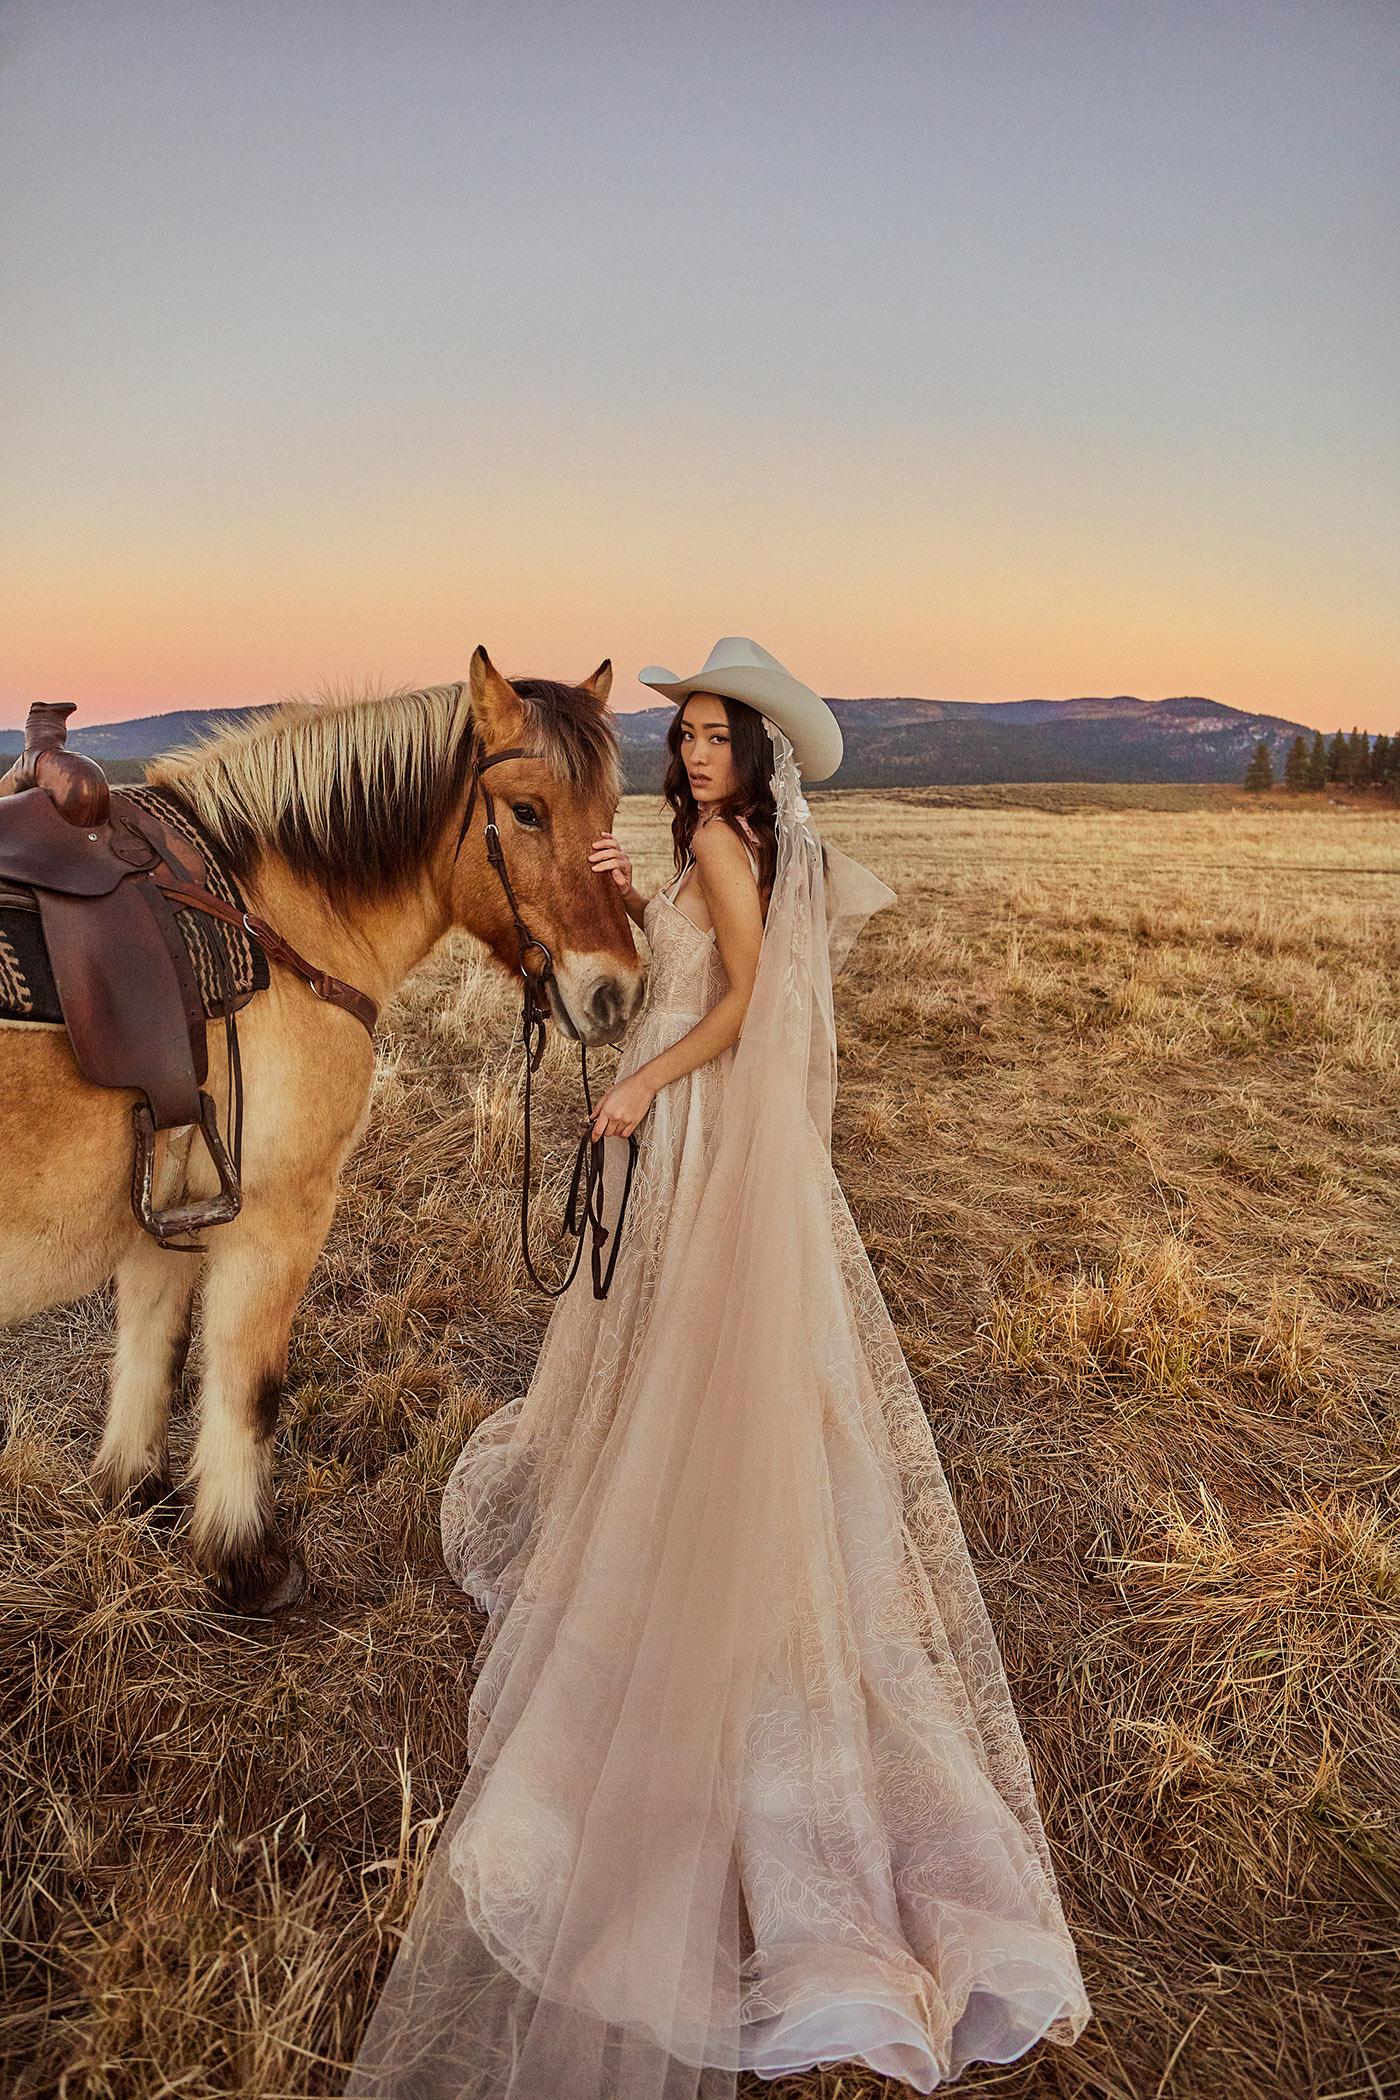 Tara Lauren Wedding Dress with horse